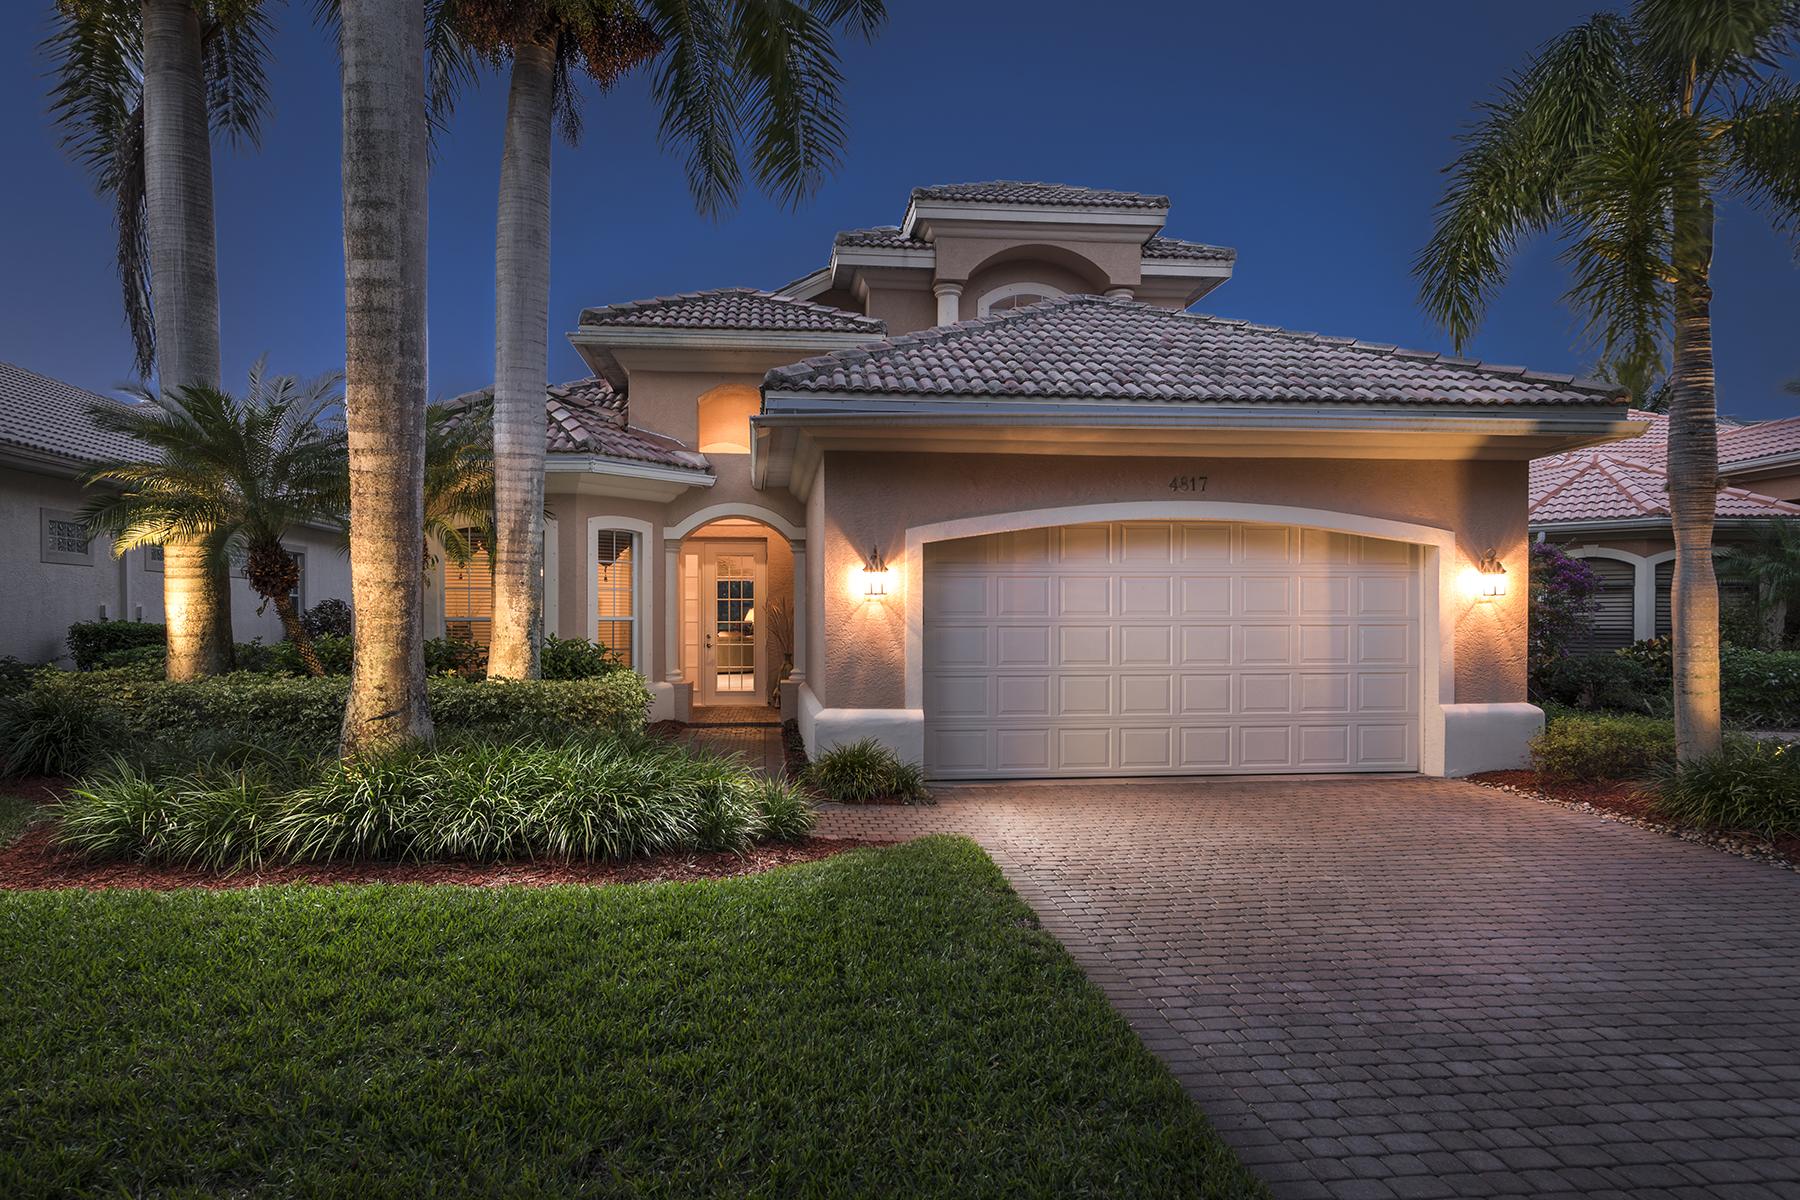 Single Family Home for Sale at KENSINGSTON - NOTTINGHAM COVE 4817 Keswick Way Naples, Florida, 34105 United States